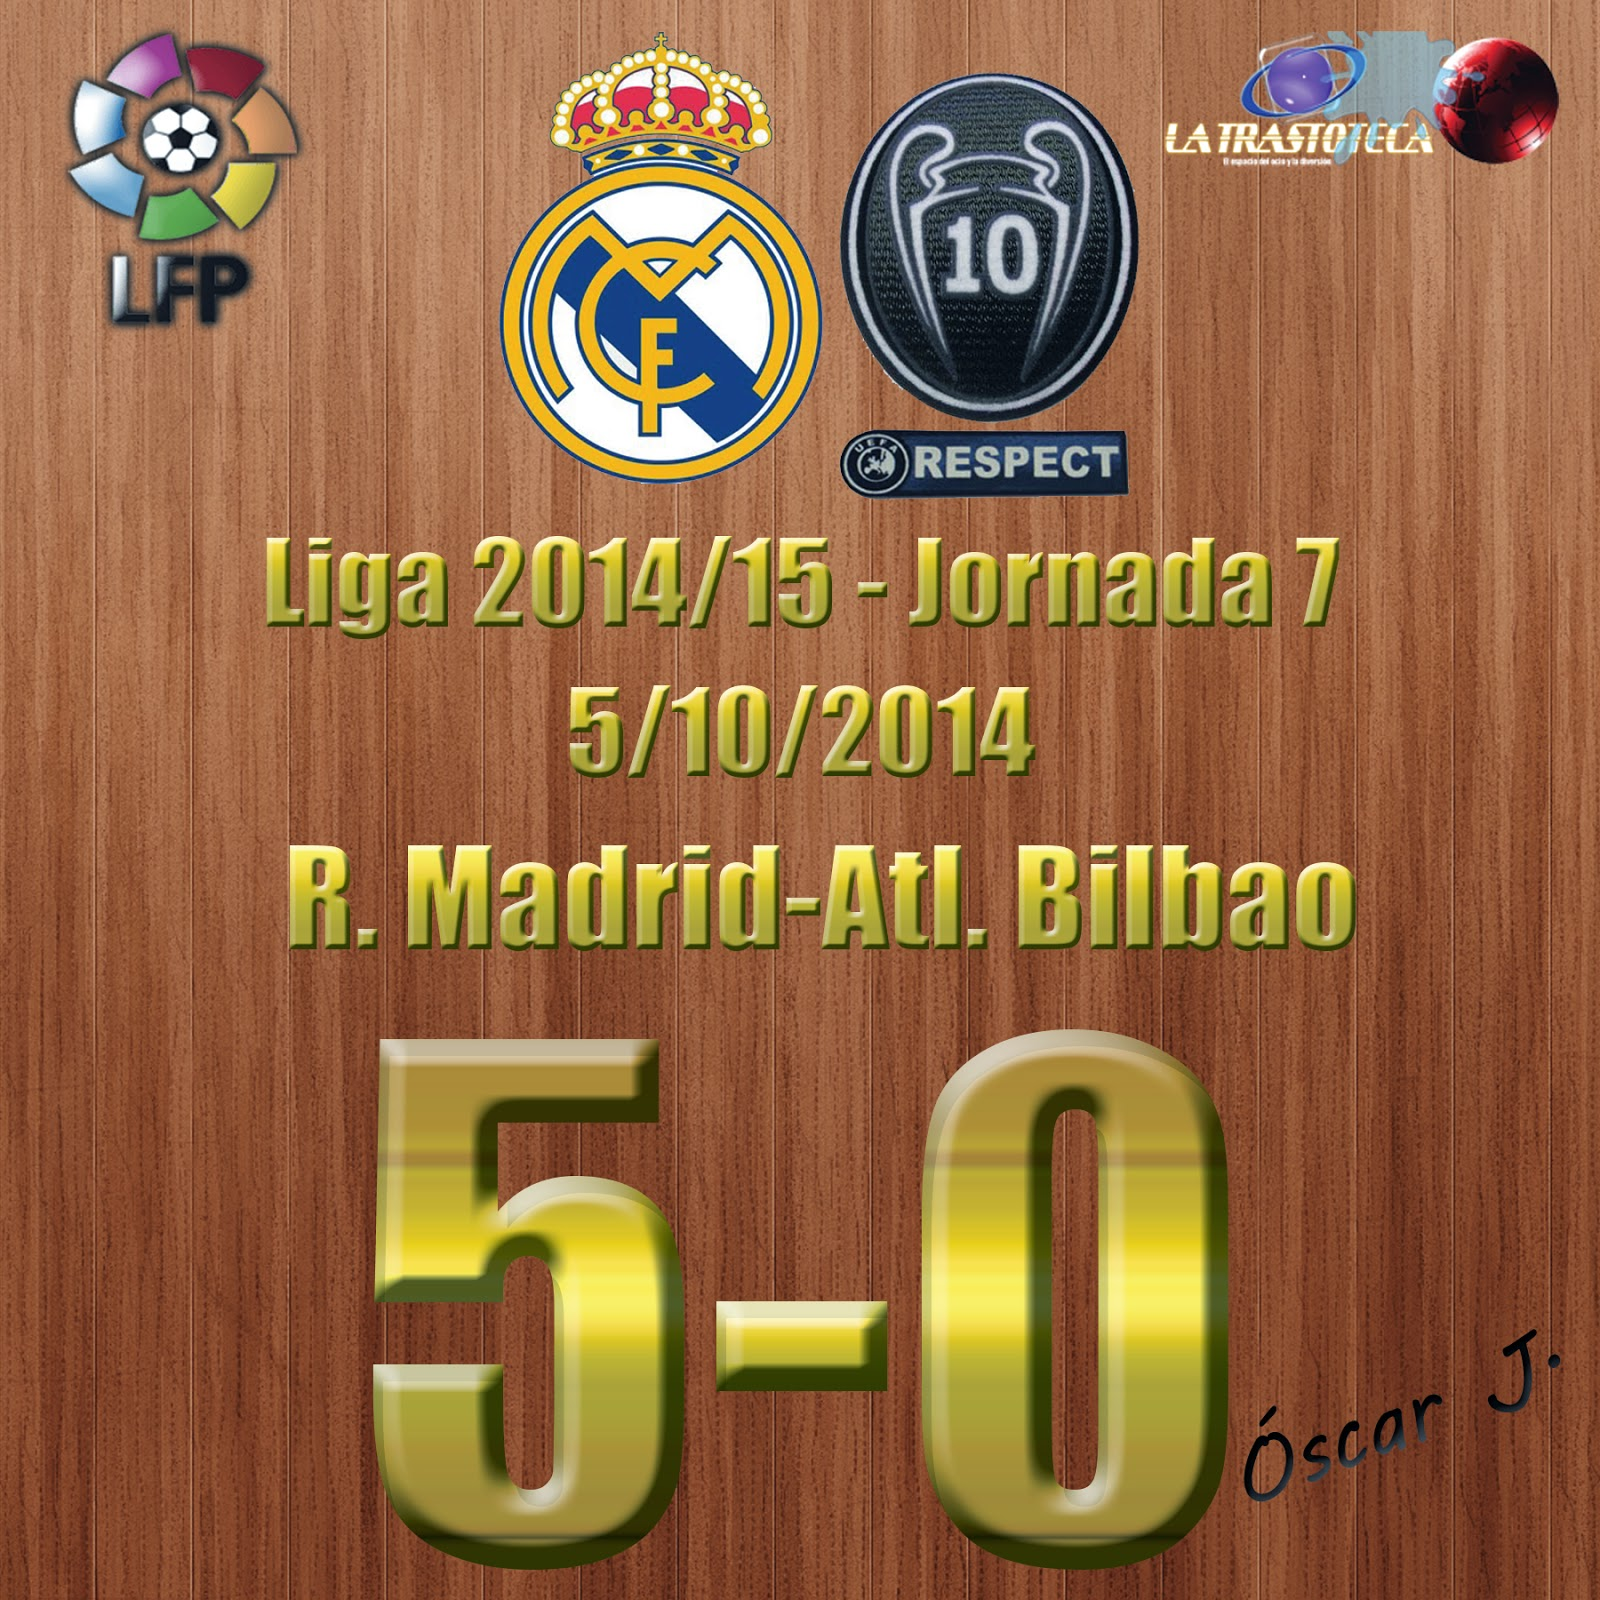 Real Madrid 5-0 Atletic Bilbao